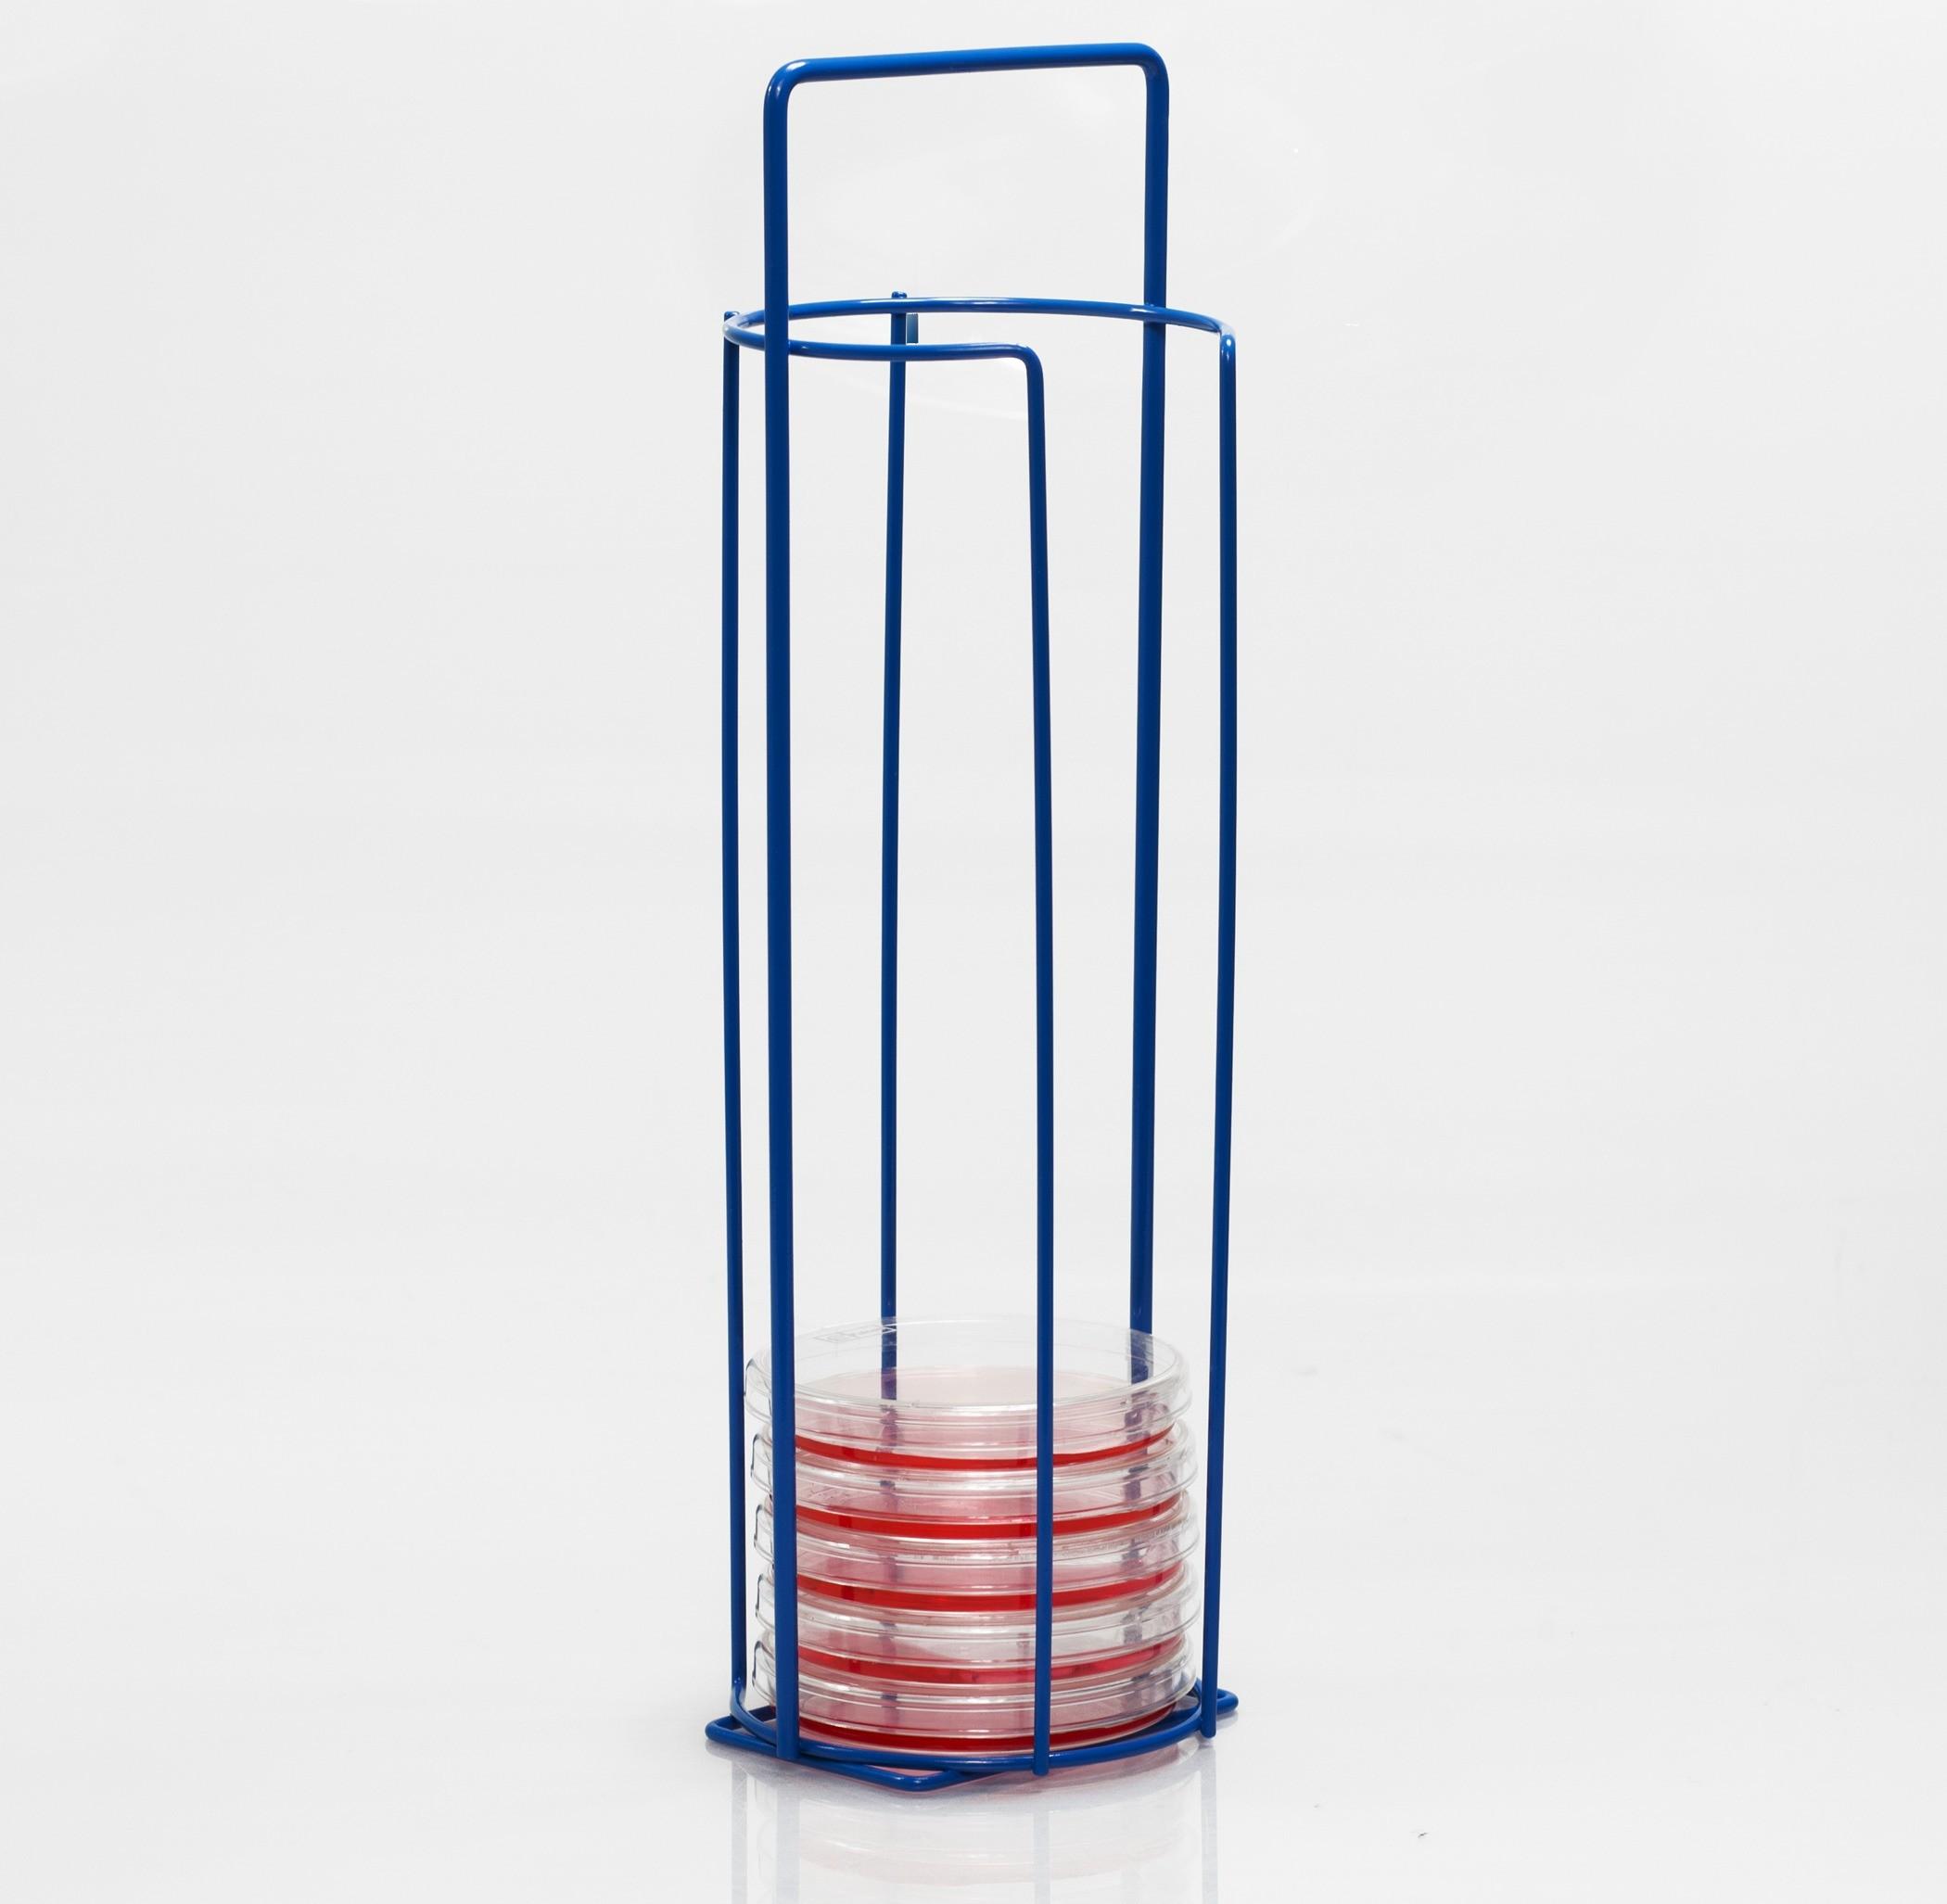 SP Bel-Art Poxygrid 100mm Petri Dish Carrying Rack; 15 Places